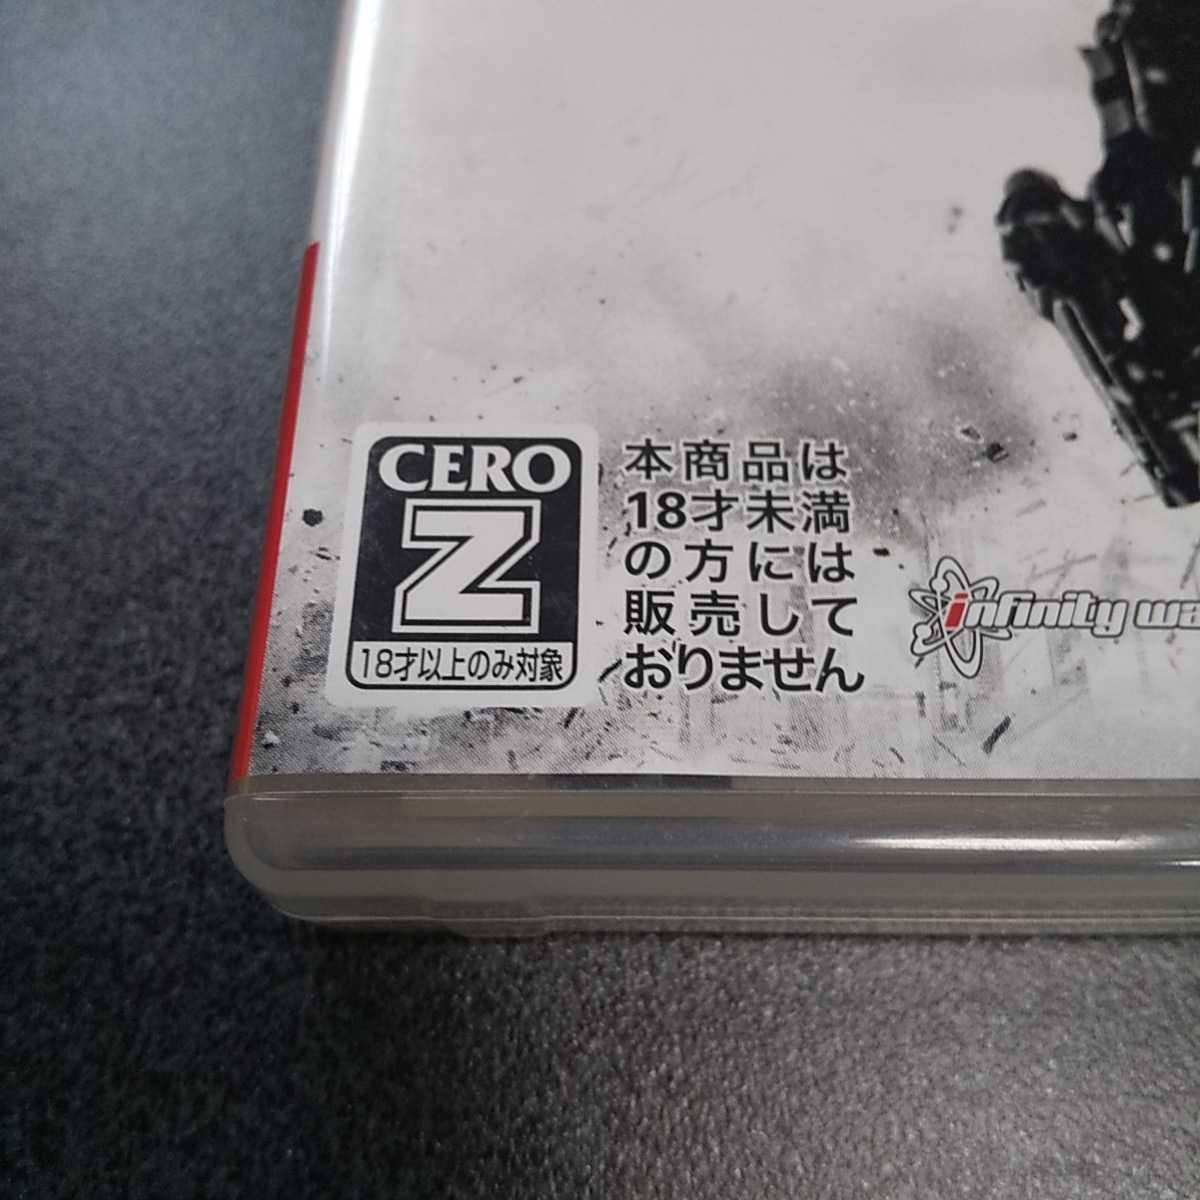 PS3【コールオブデューティ/モダン・ウォーフェア3(吹き替え版)】2011年スクウェア・エニックス※対象年齢18歳以上 返金保証あり